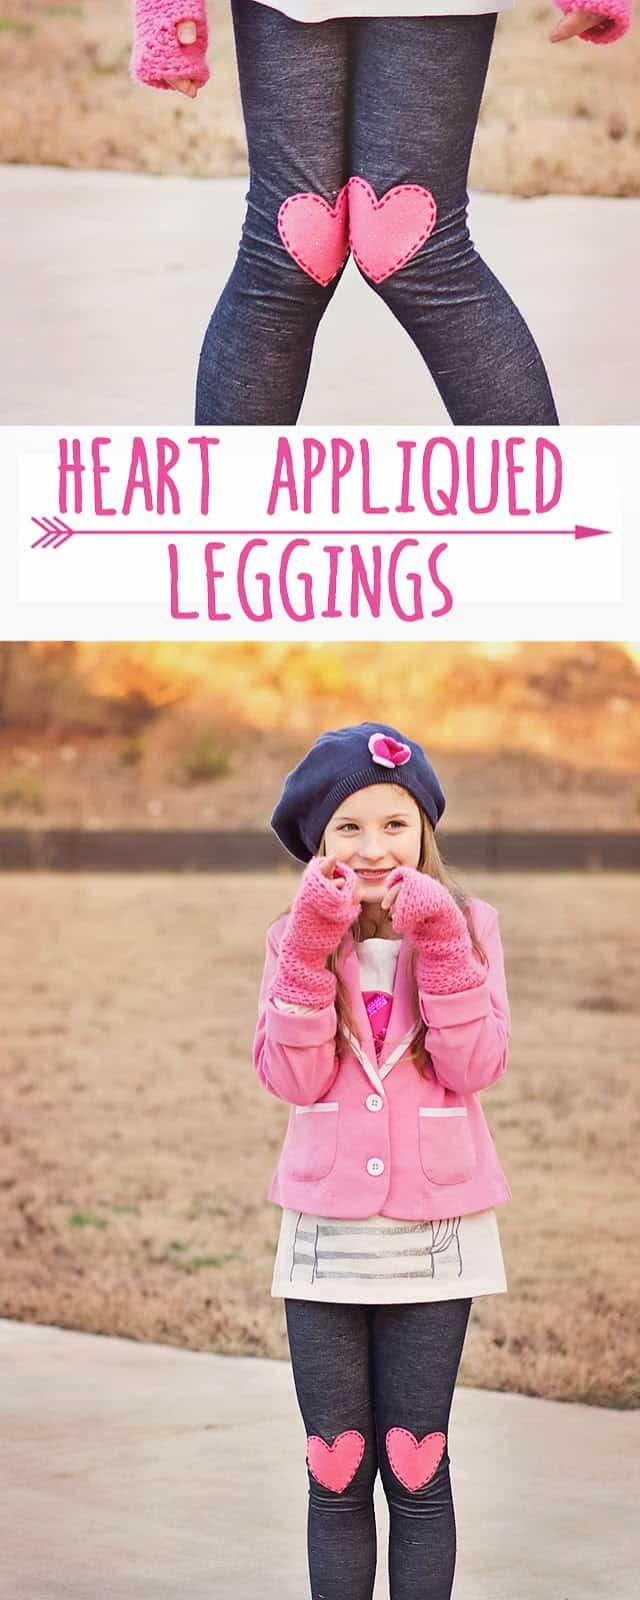 heart-applique-leggings